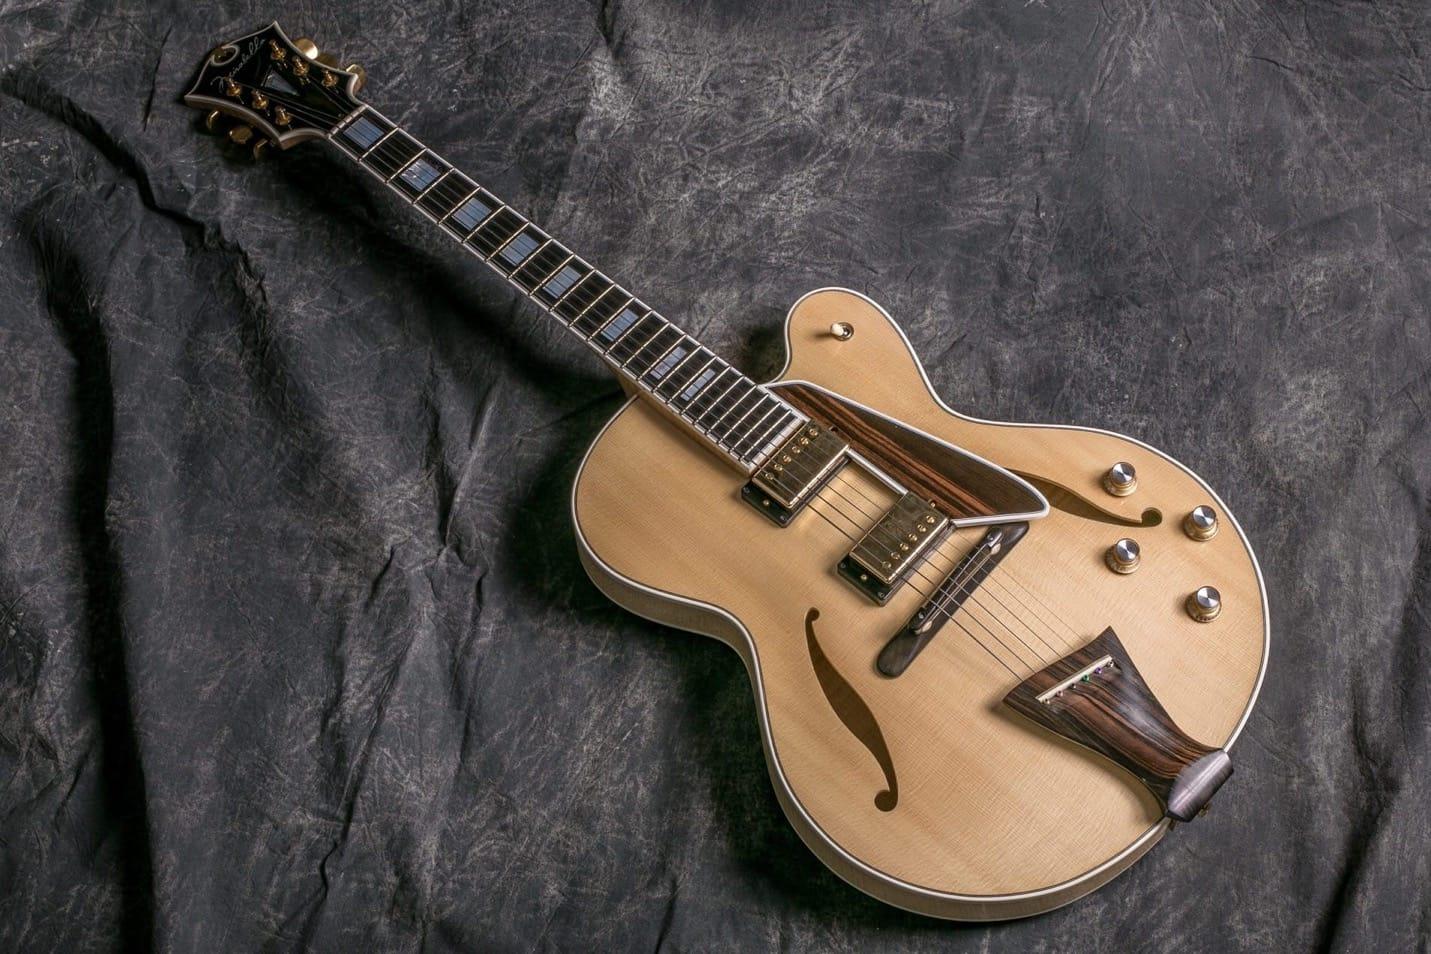 Mirabella Jazz Classic Electric Dual Pickup Guitar